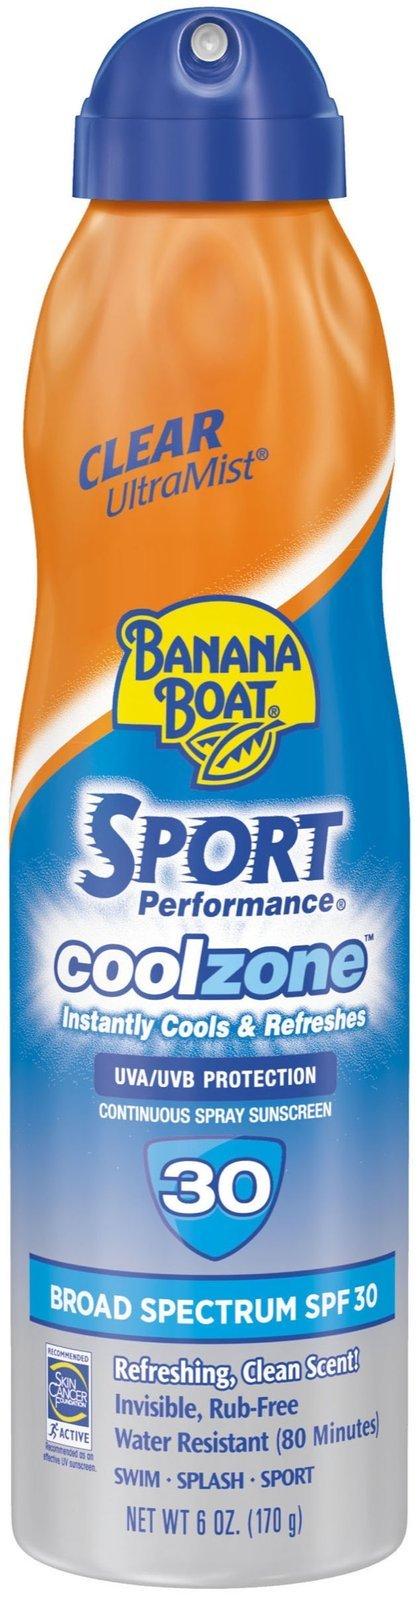 Banana Boat Sport Performance Coolzone SPF 30 - 6 oz